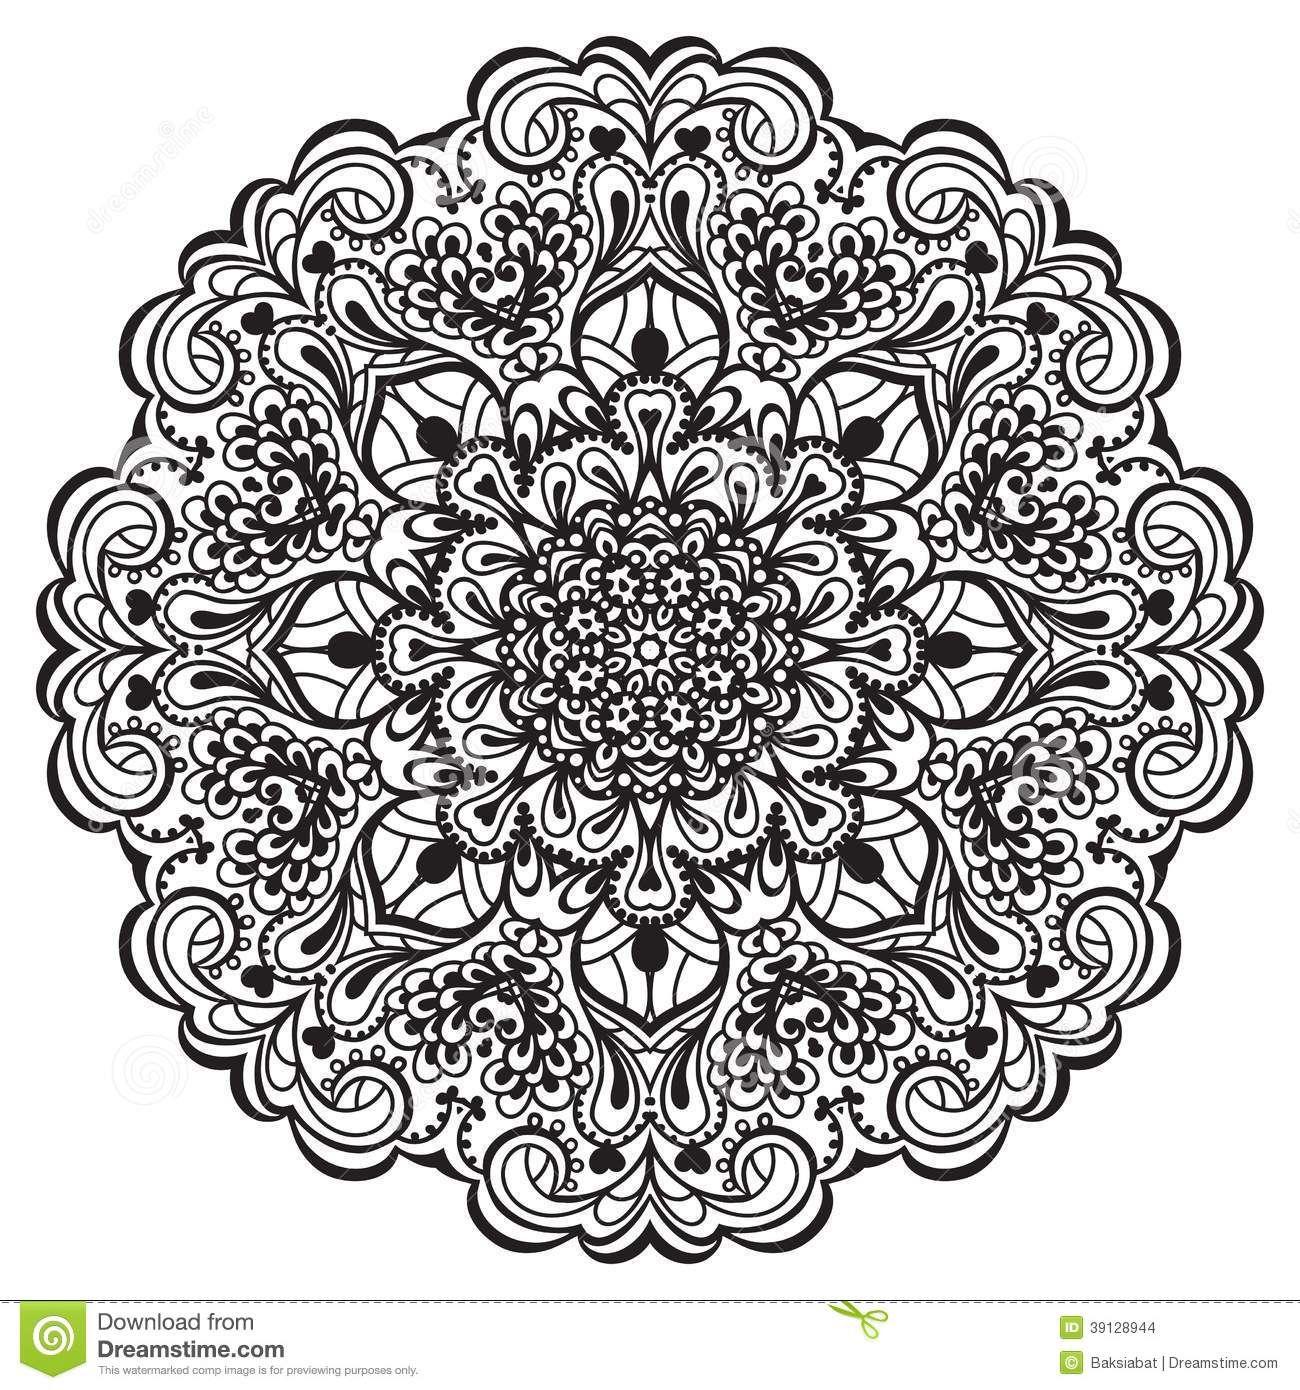 Lotus flower mandala template google search mandalas izmirmasajfo